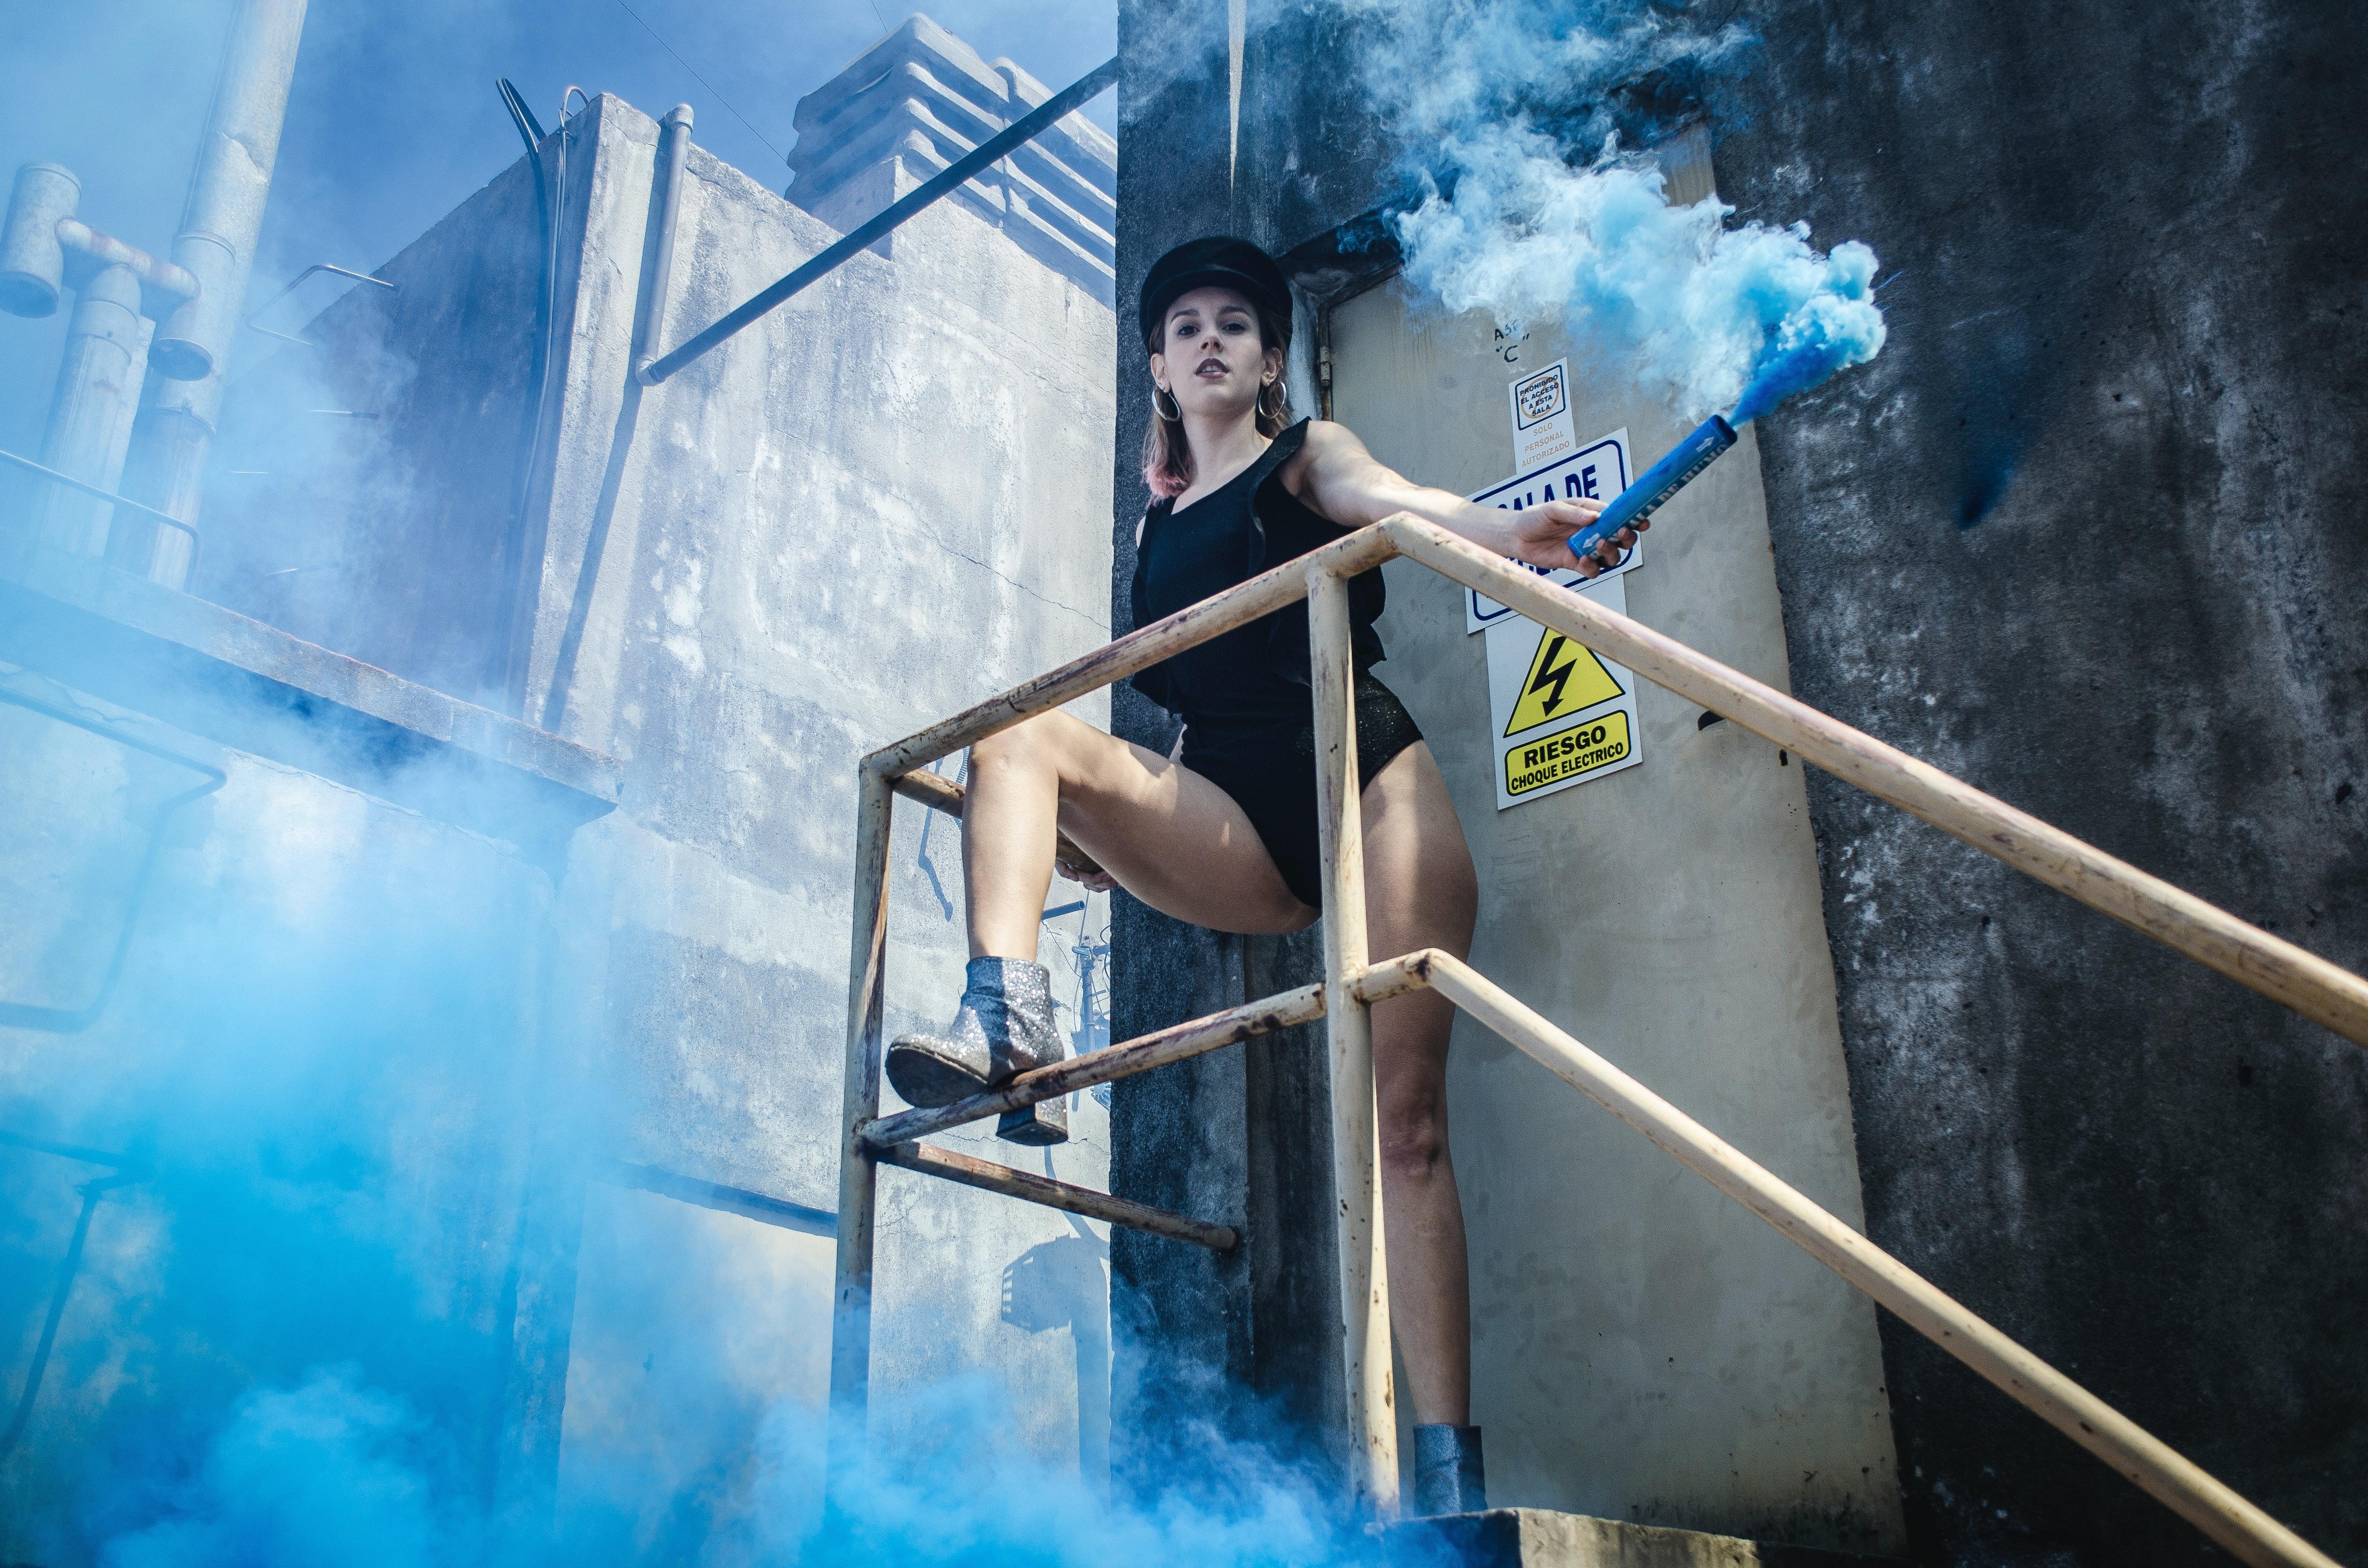 500 Beautiful Smoke Bomb Photos Pexels Free Stock Photos